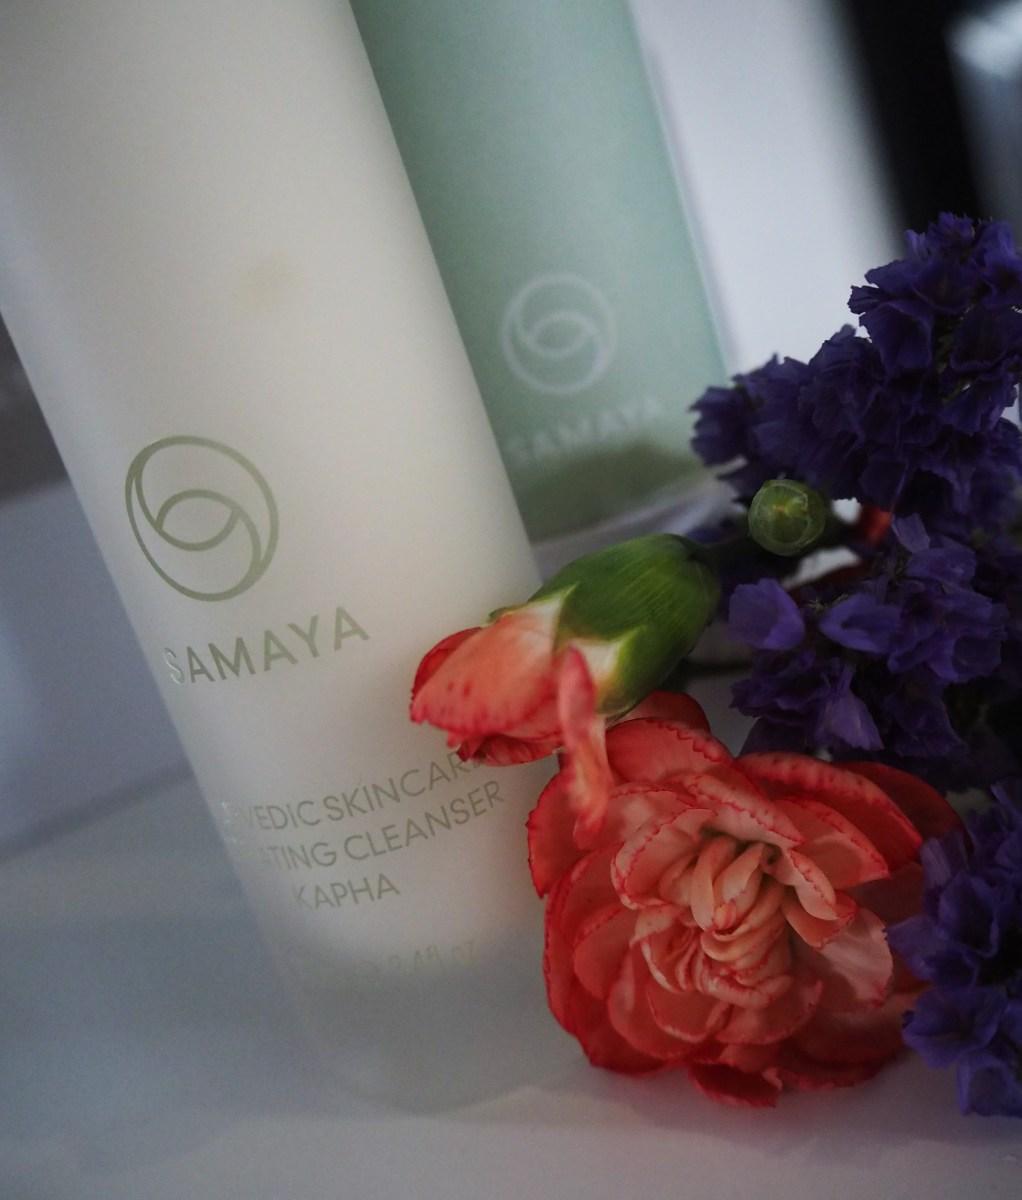 Samaya Ayurvedic Skincare ...